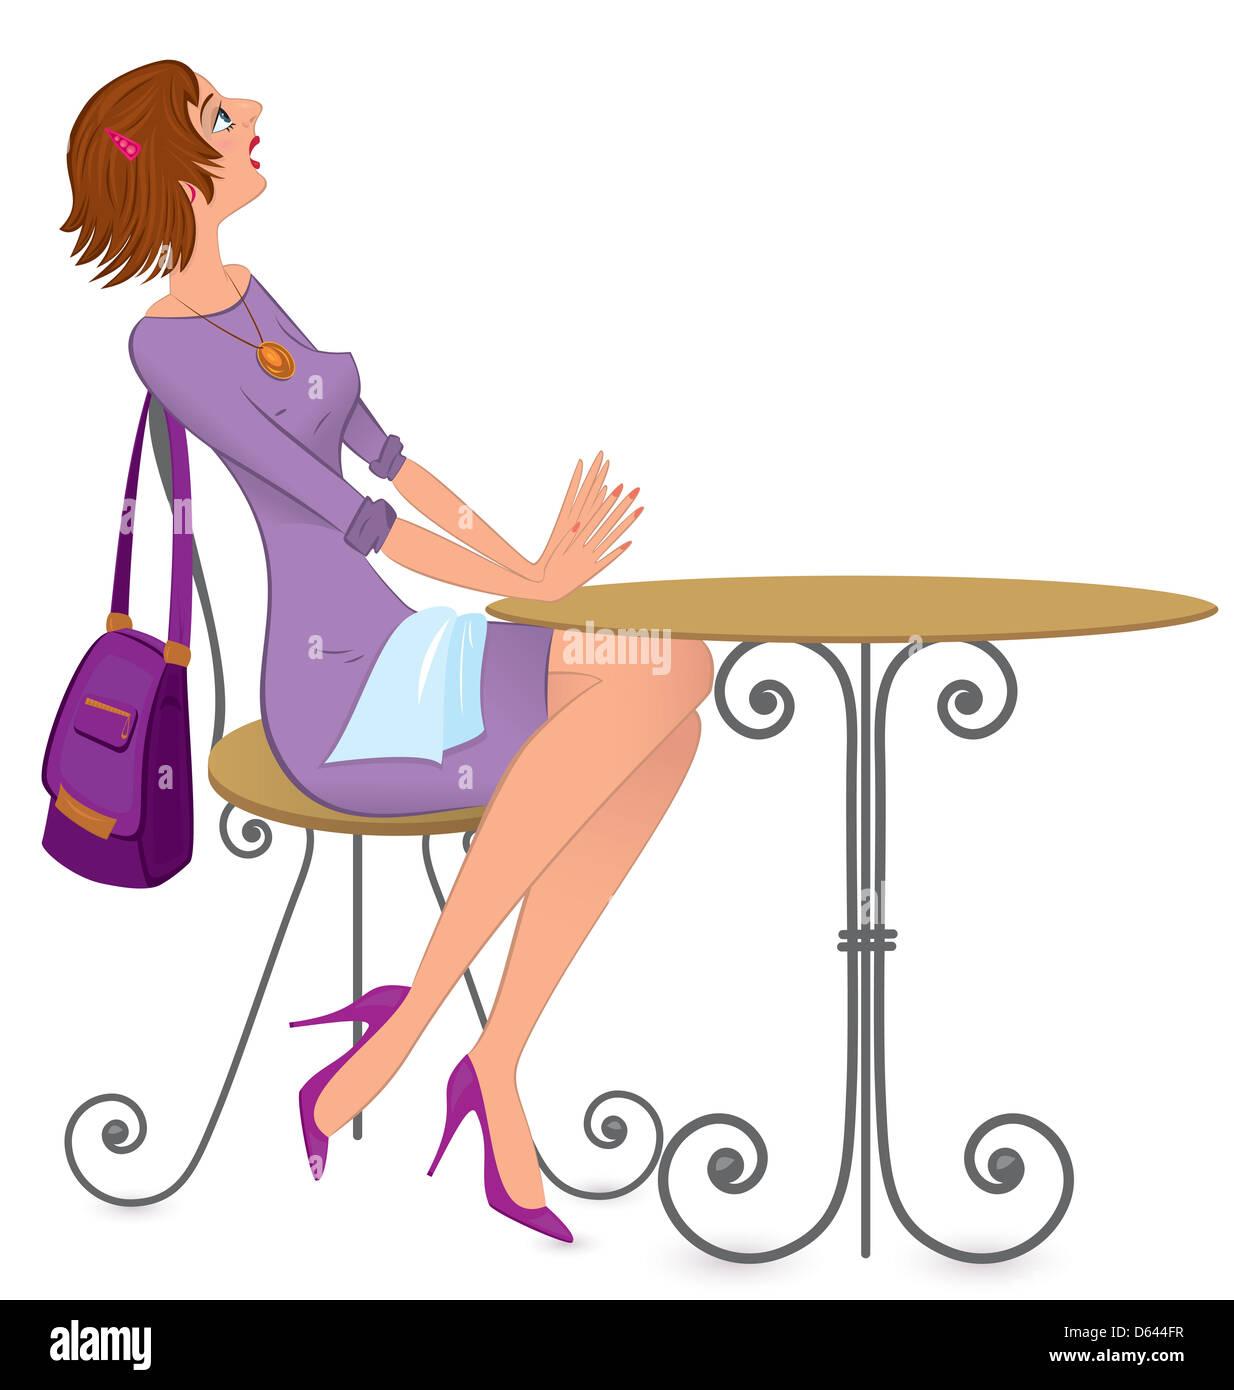 Woman with napkin  illustration Stock Photo